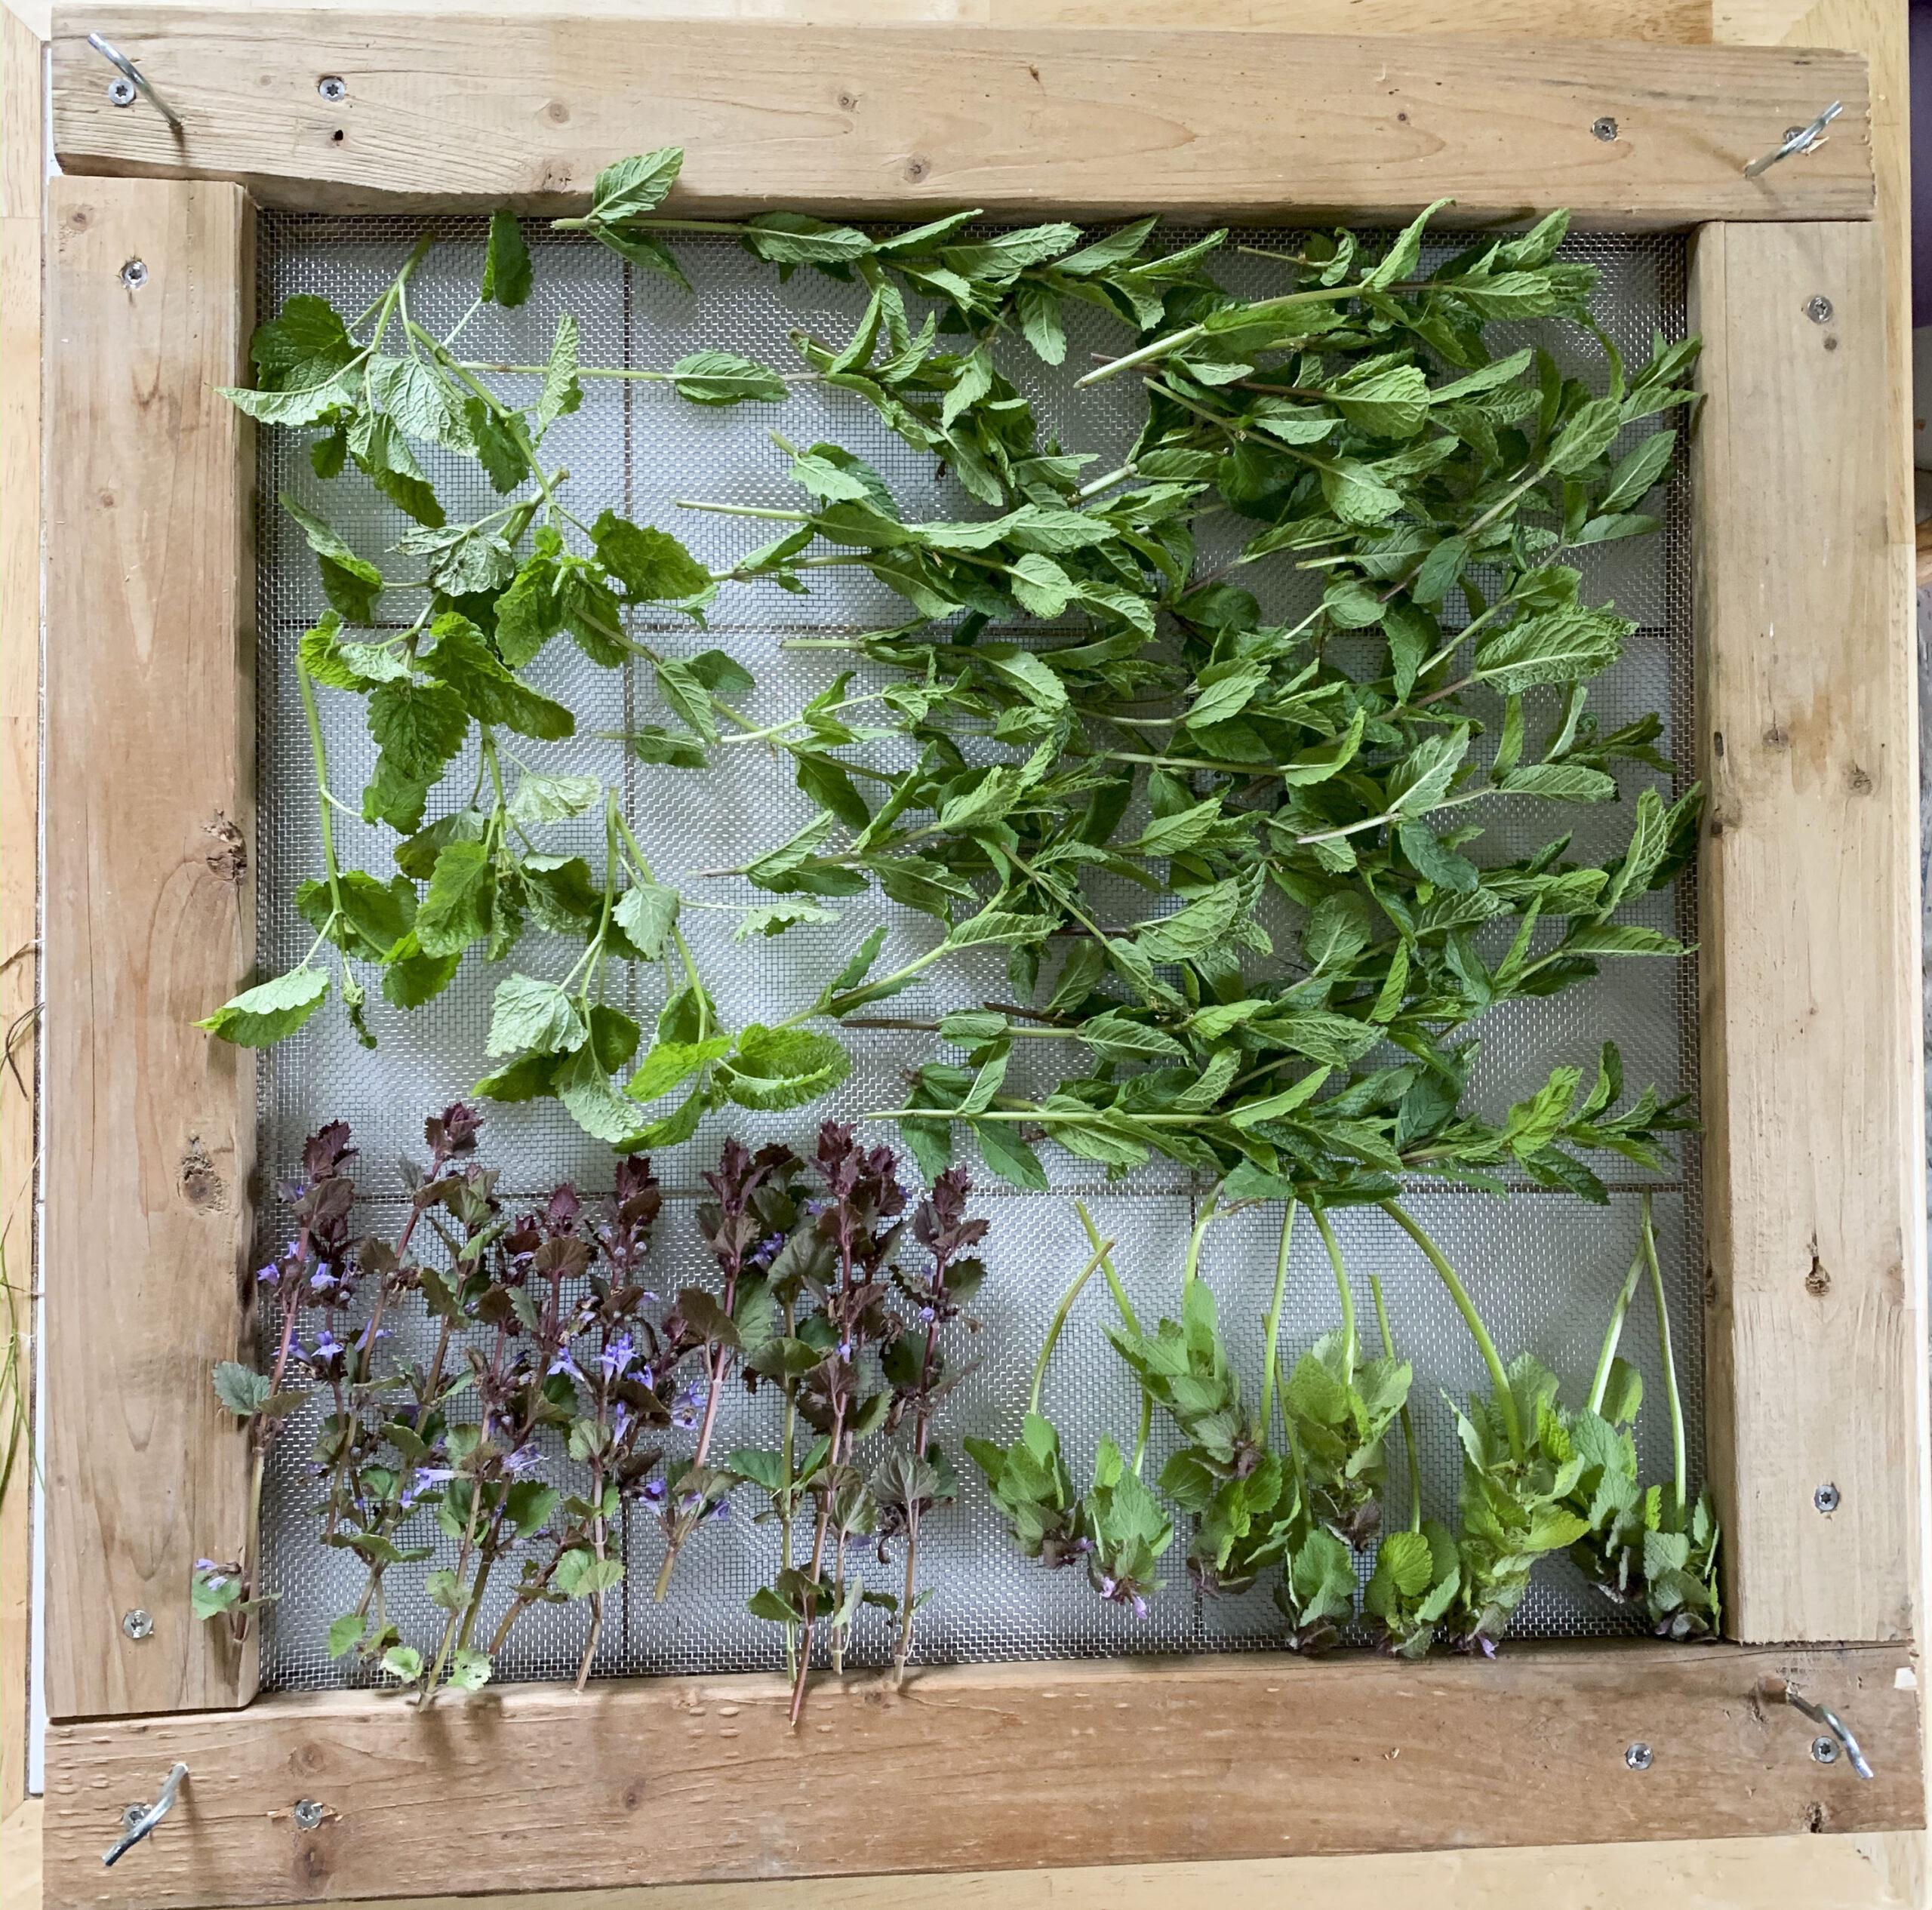 herbs drying on a homemade rack